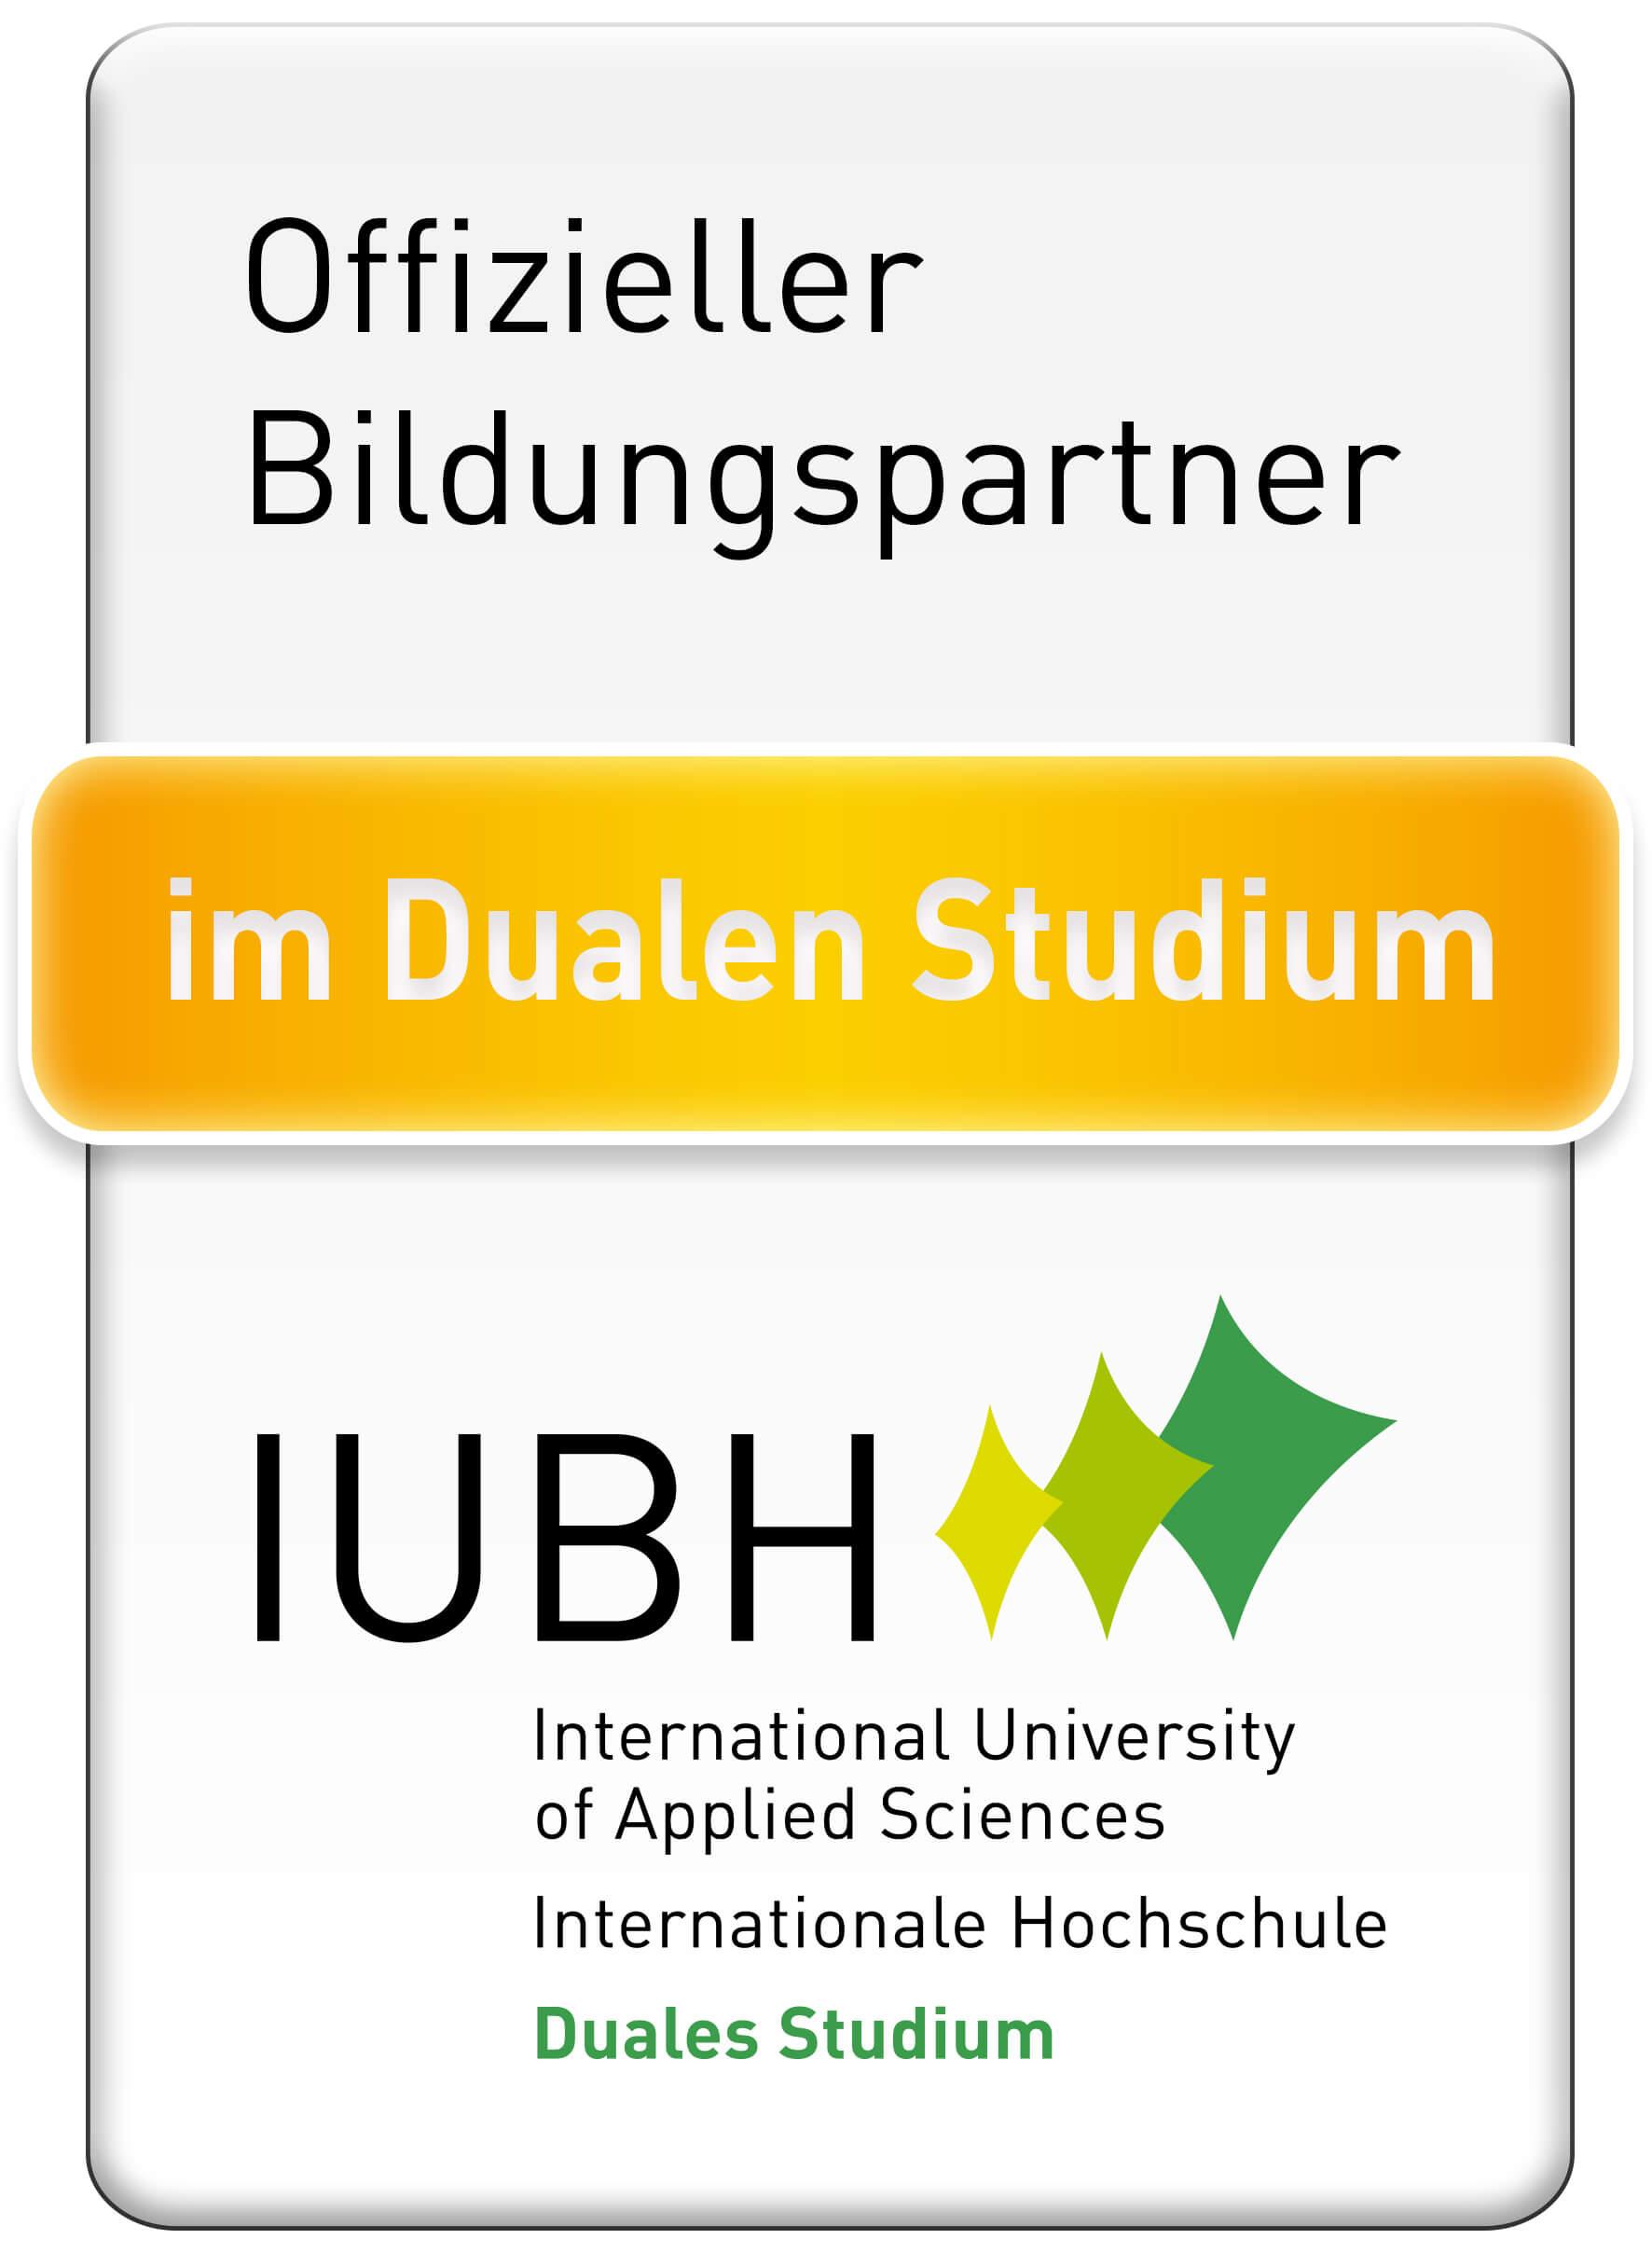 IUBH Partner